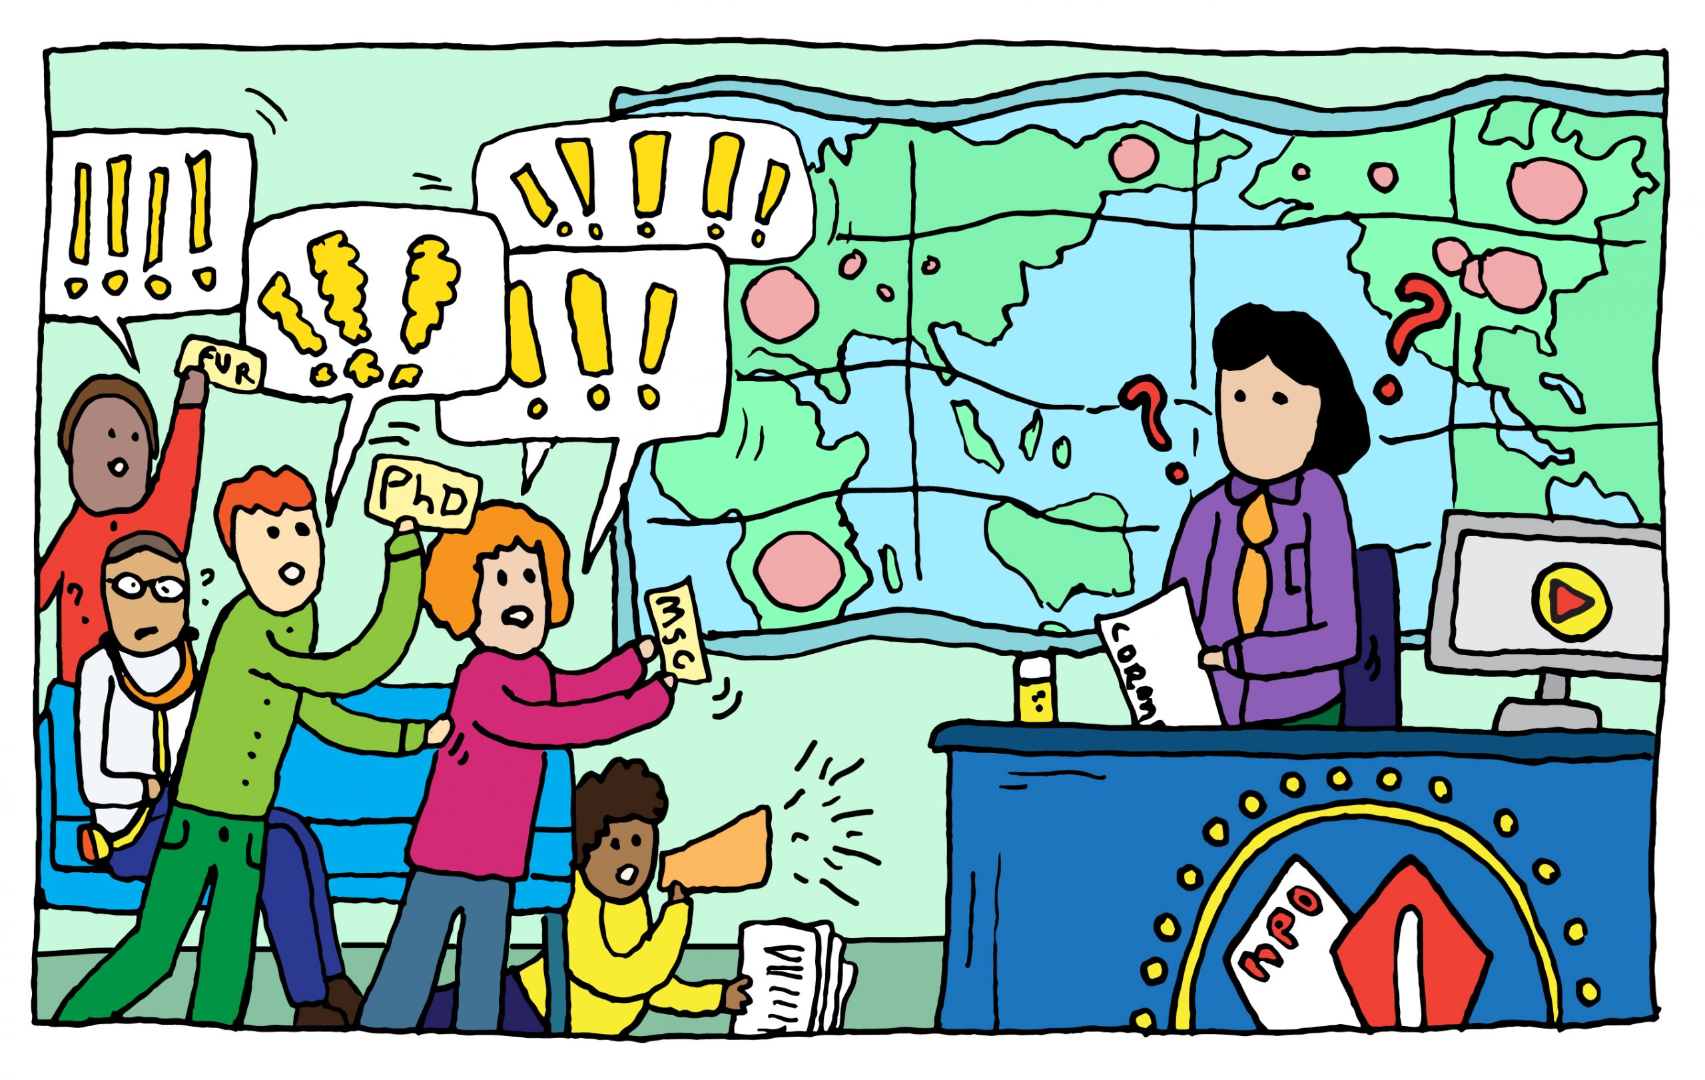 EM illustratie 12 nov 2020 Wiersema-01